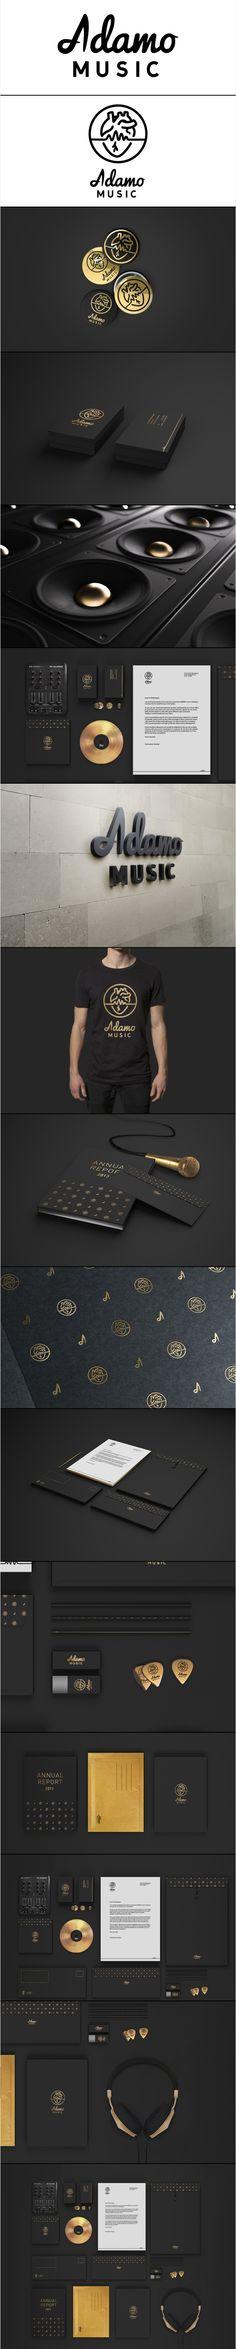 Adamo Music | Full black and gold brand identity design